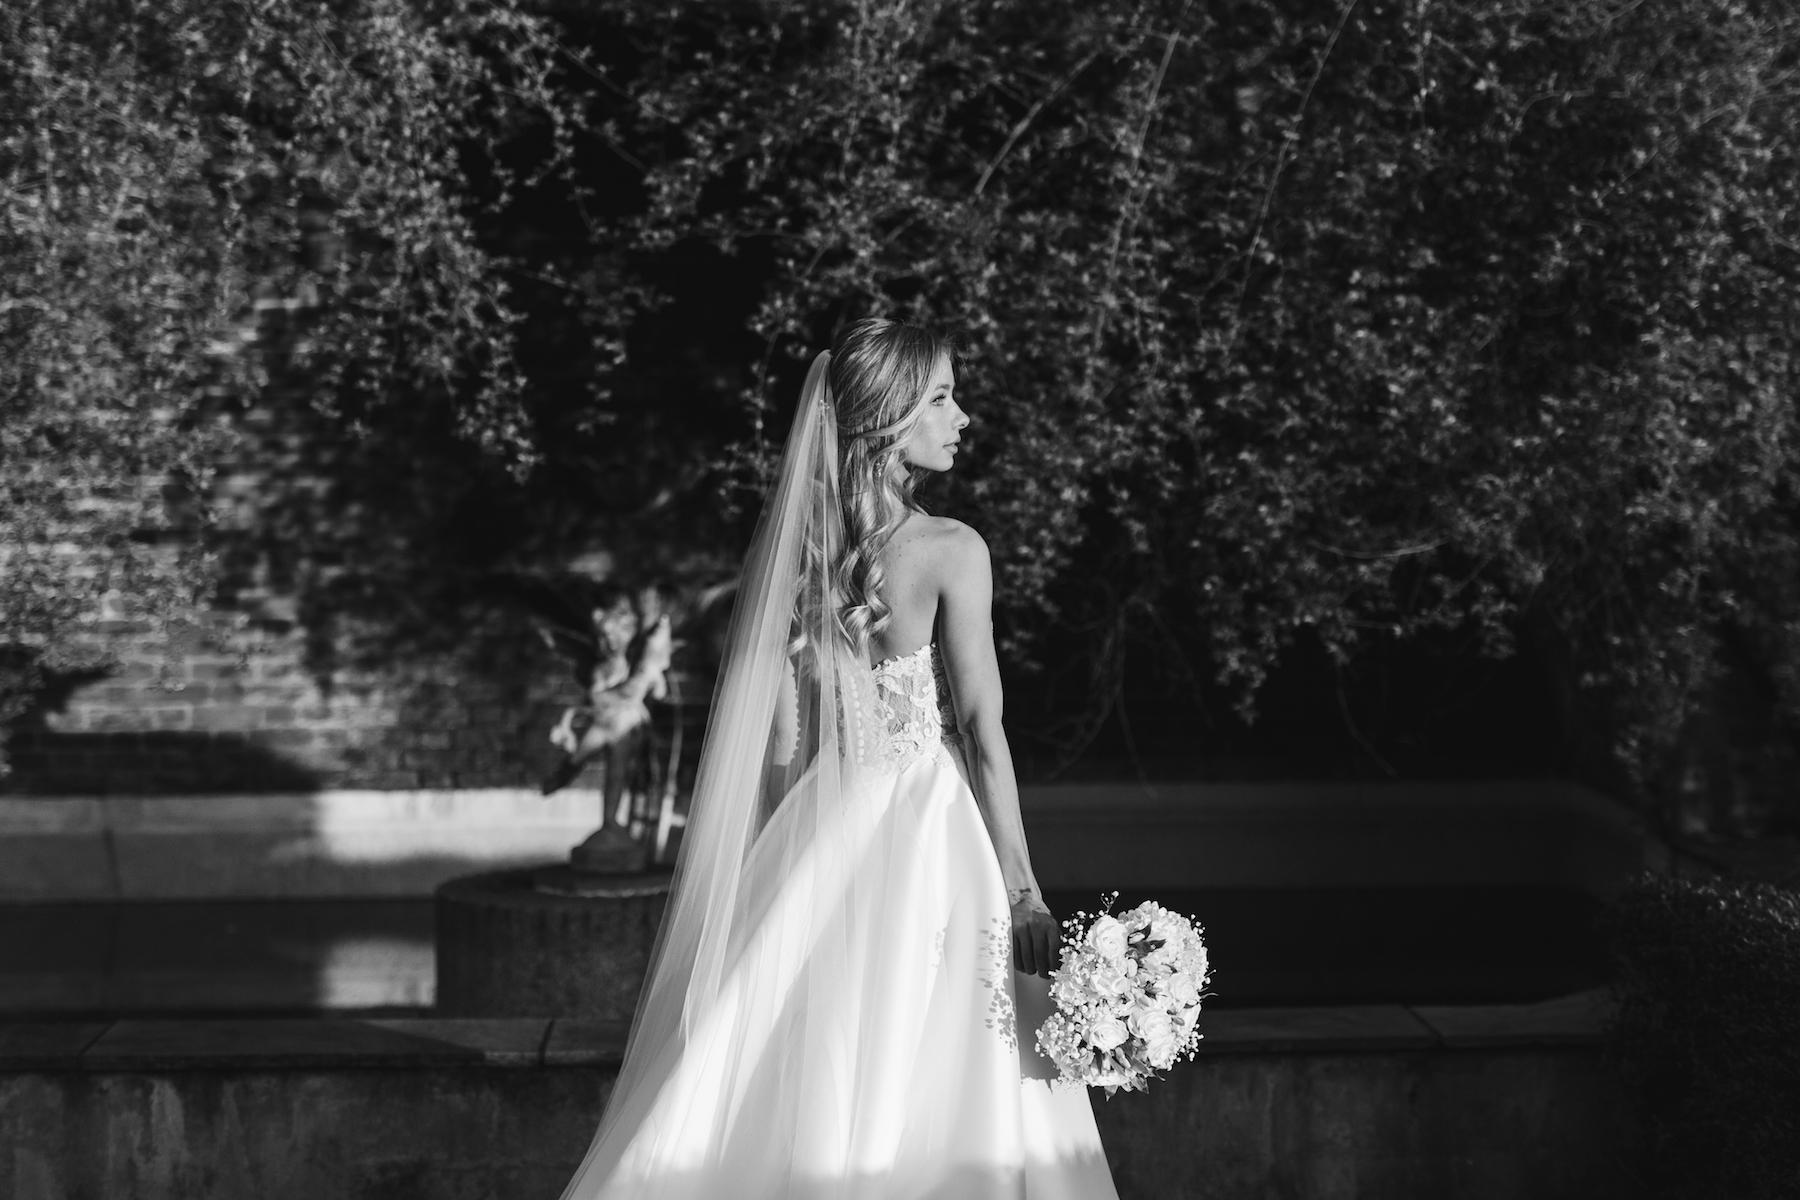 furman-university-bridals-paige-221.JPG